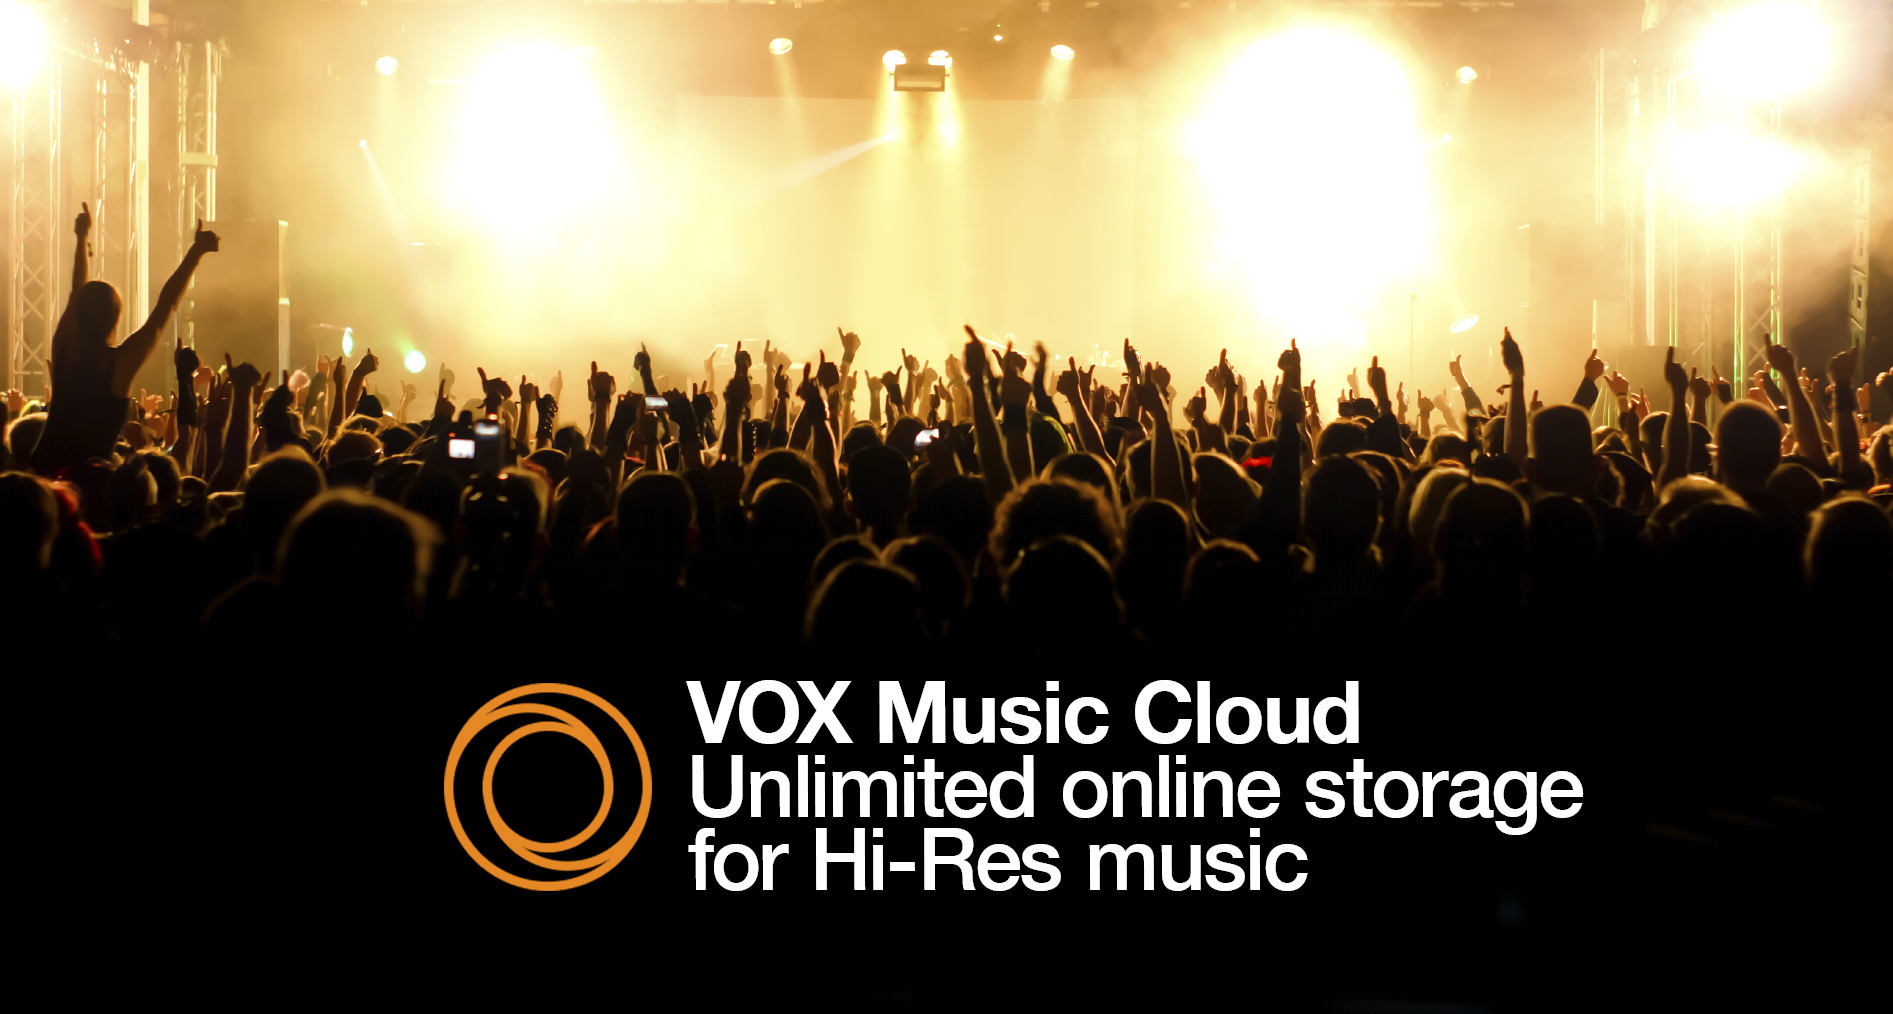 VOX Music Cloud logo